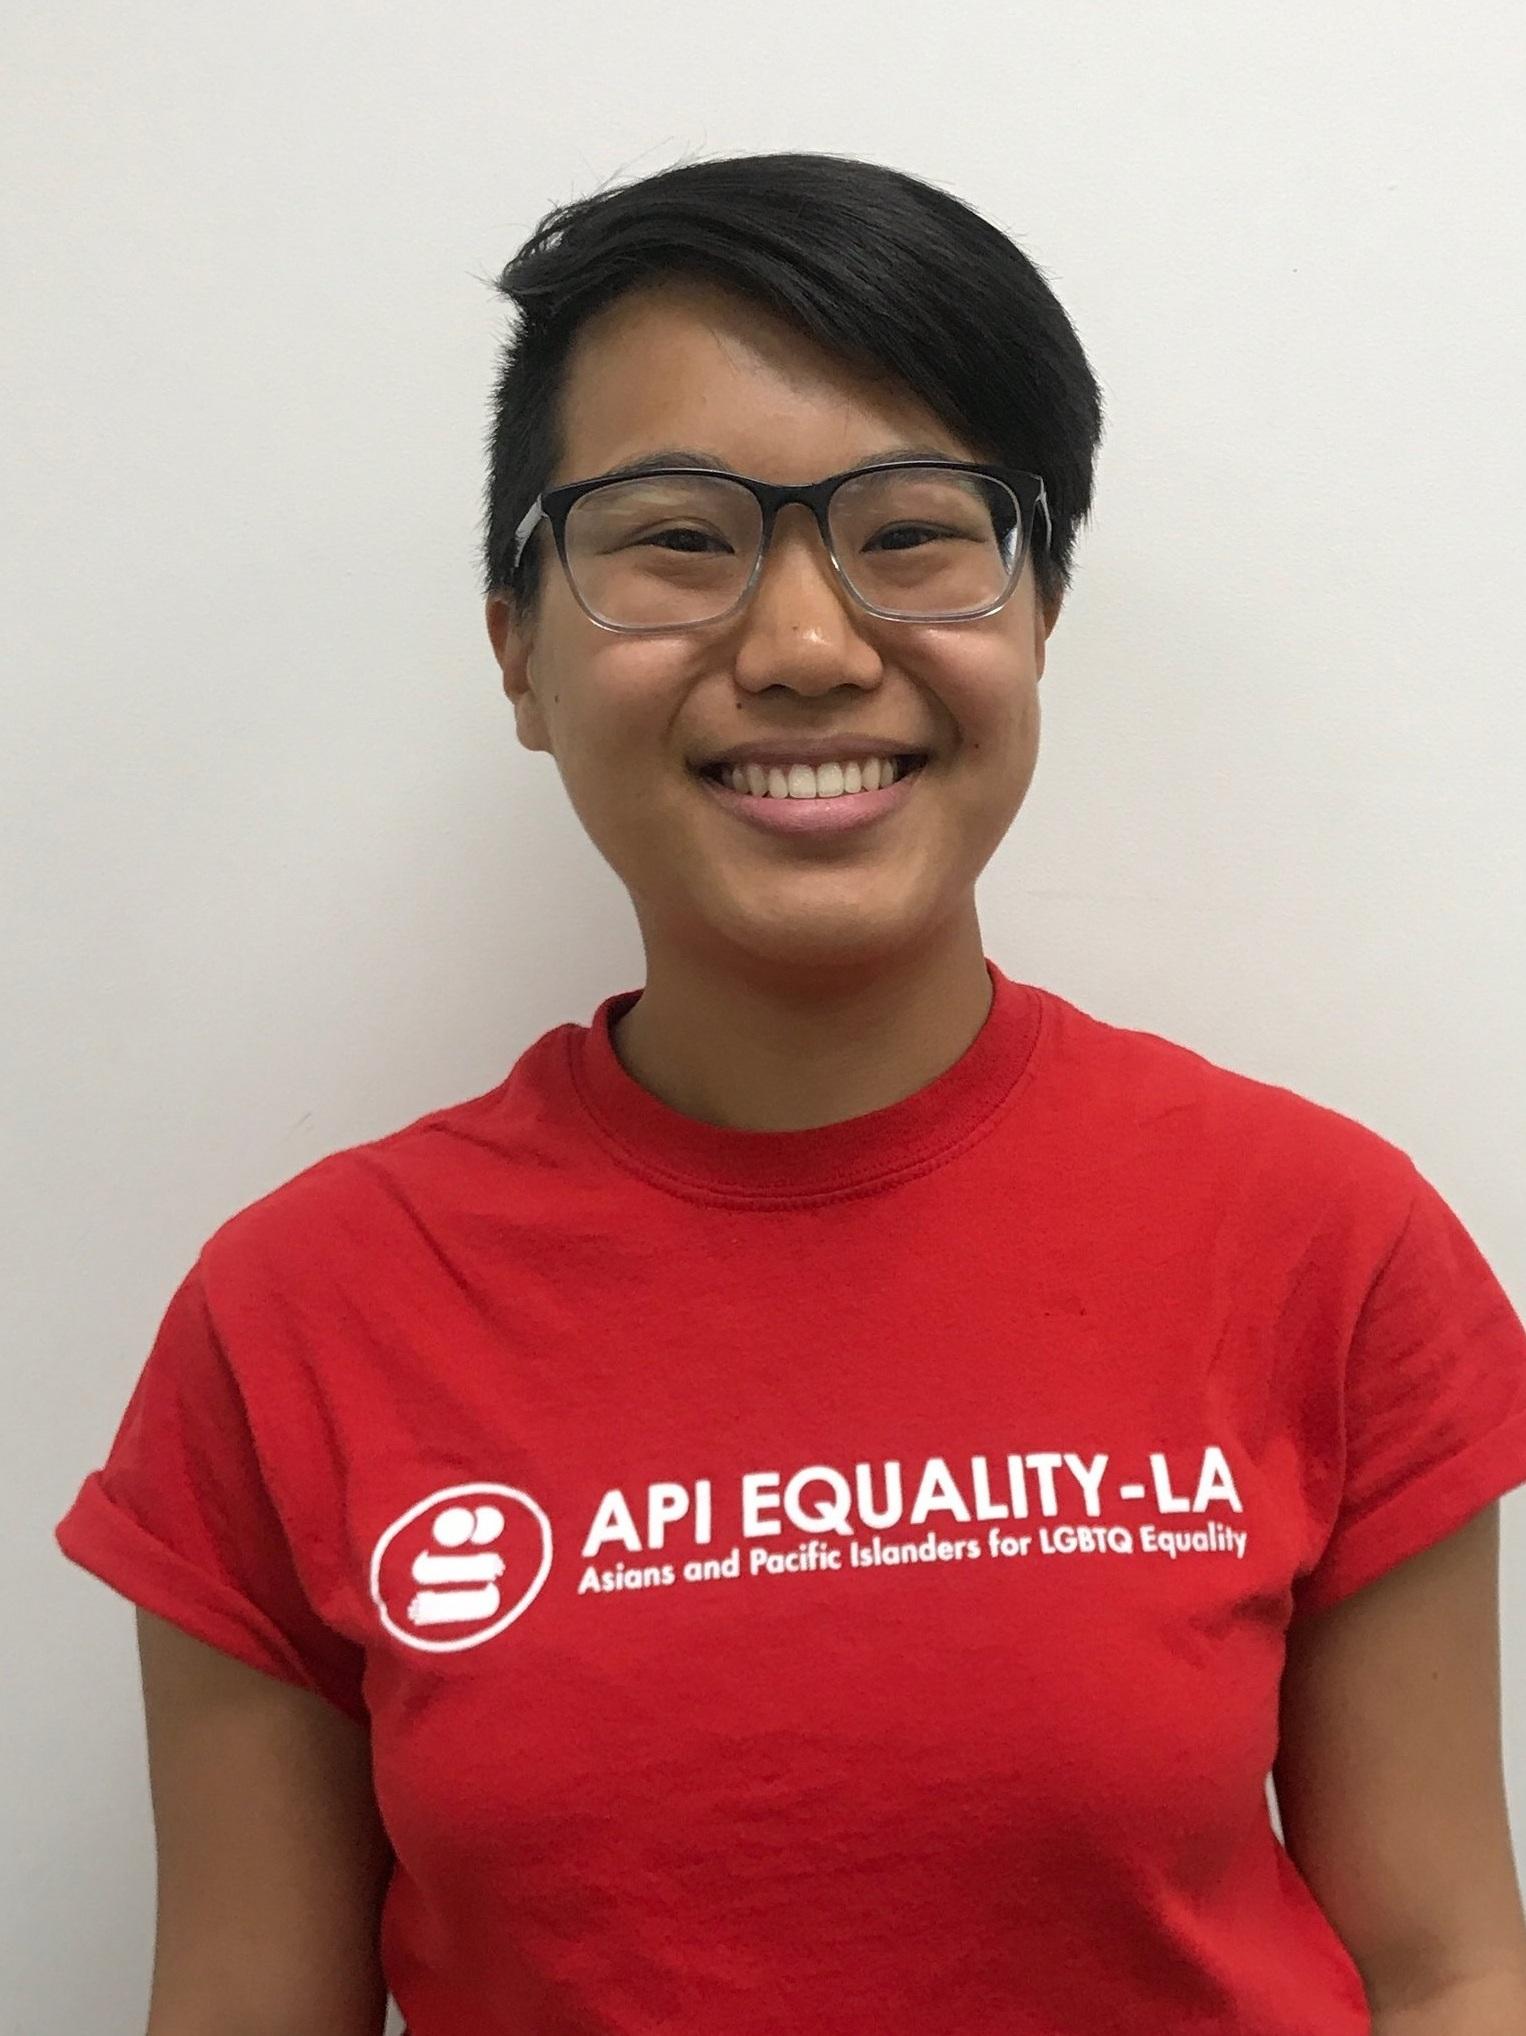 Queer+Trans+Activist+Training.jpg